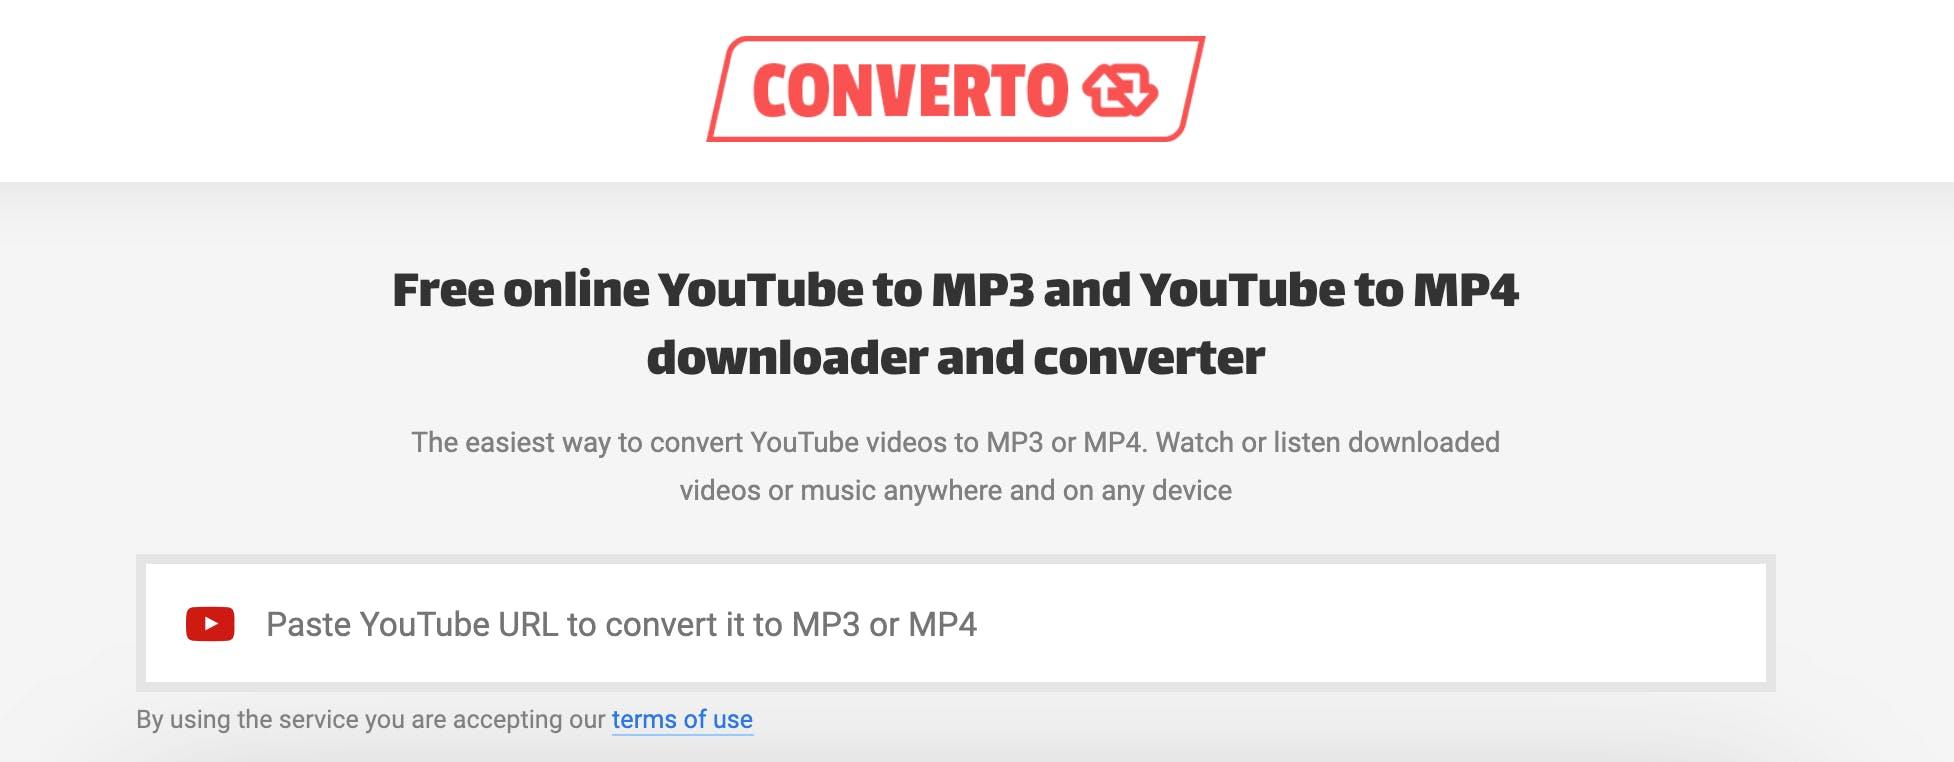 Converto youtube converter